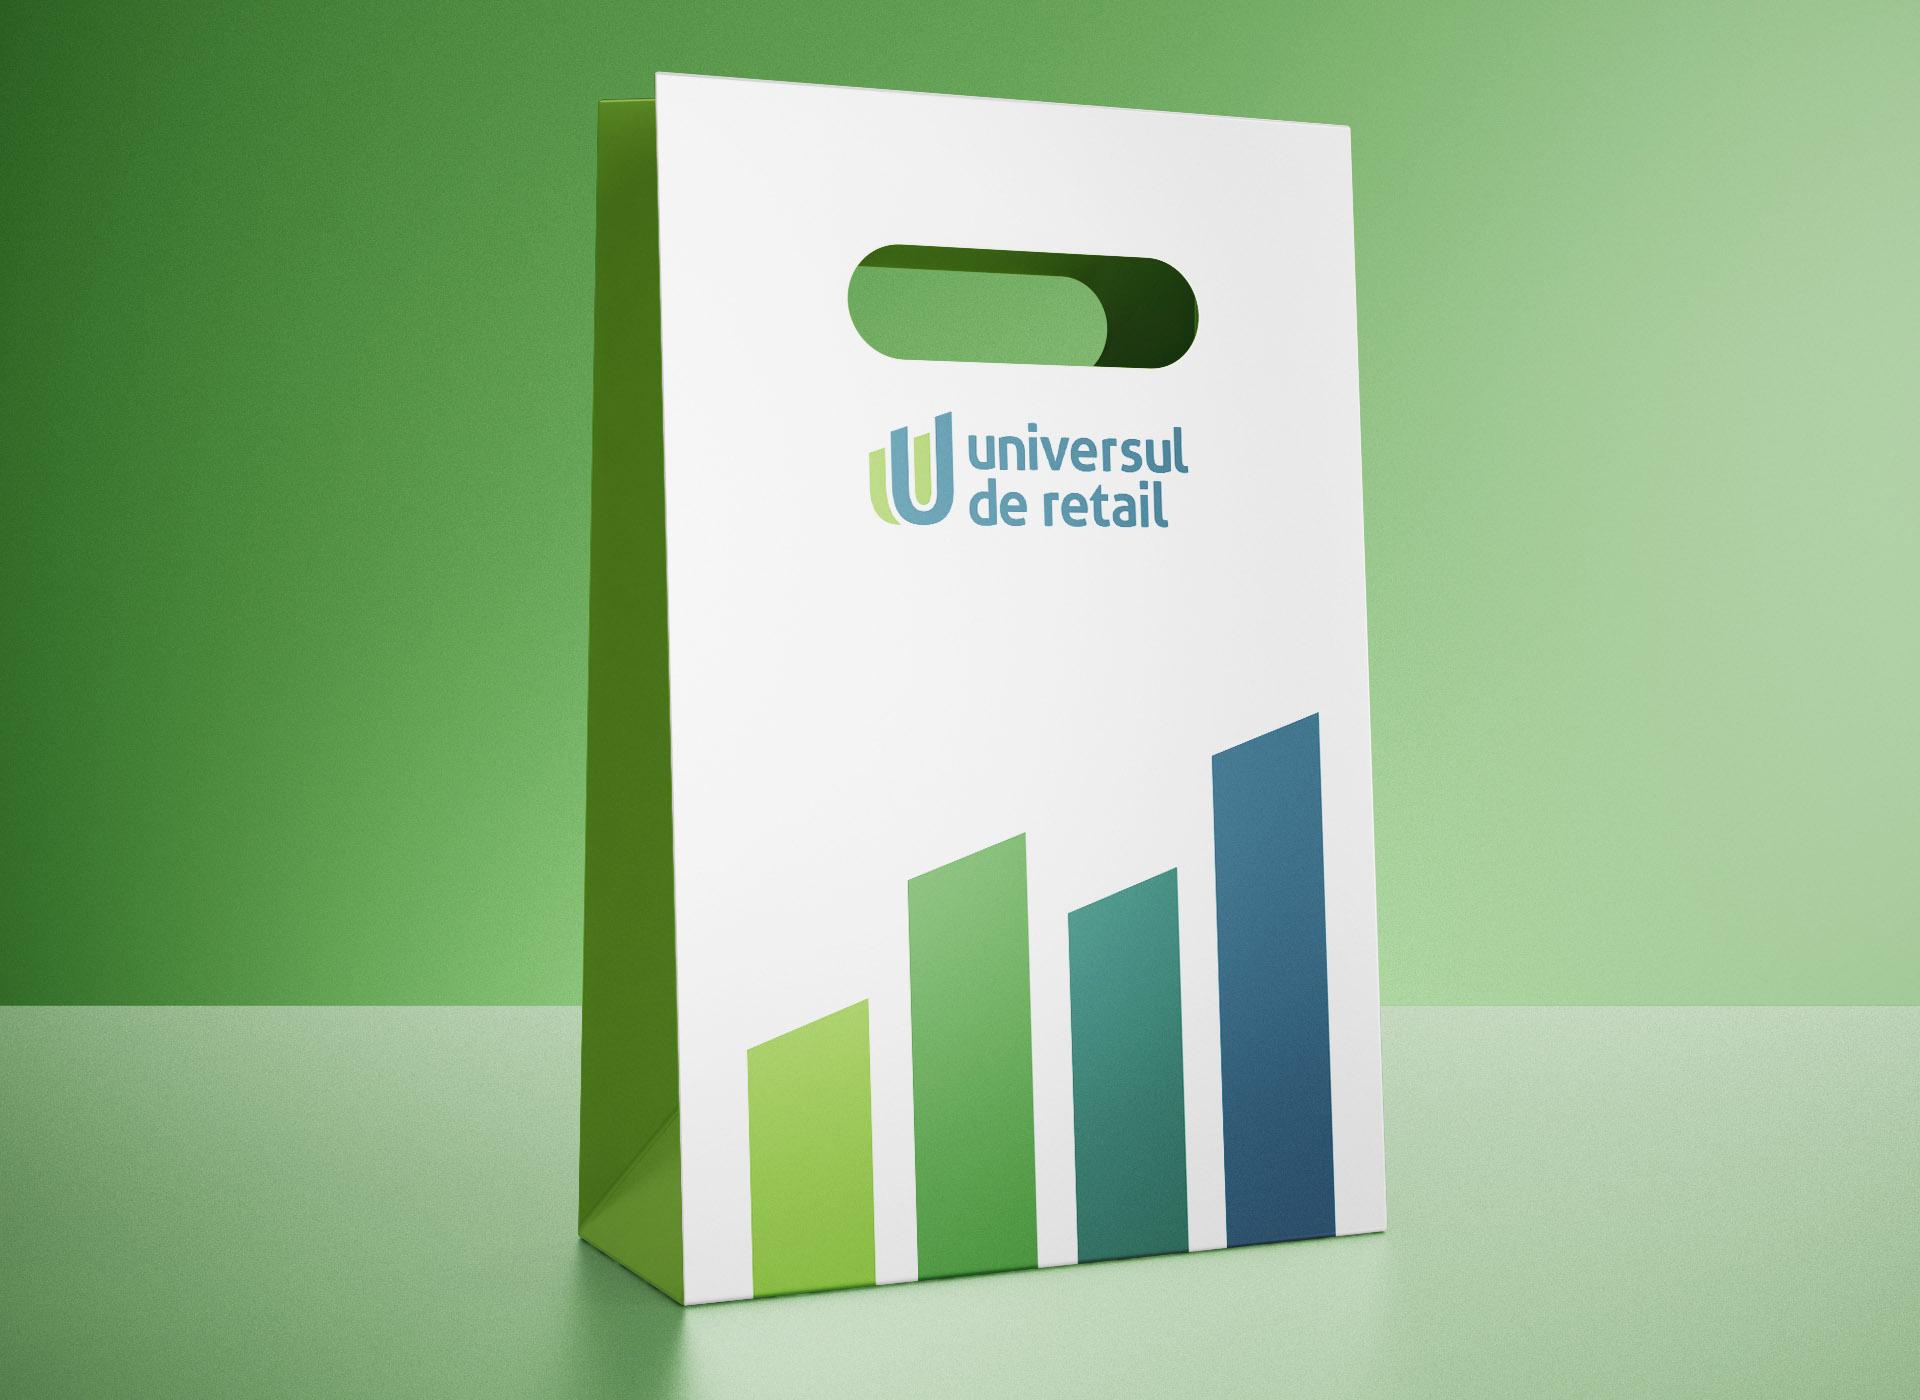 universul de retail portofoliu inoveo bag